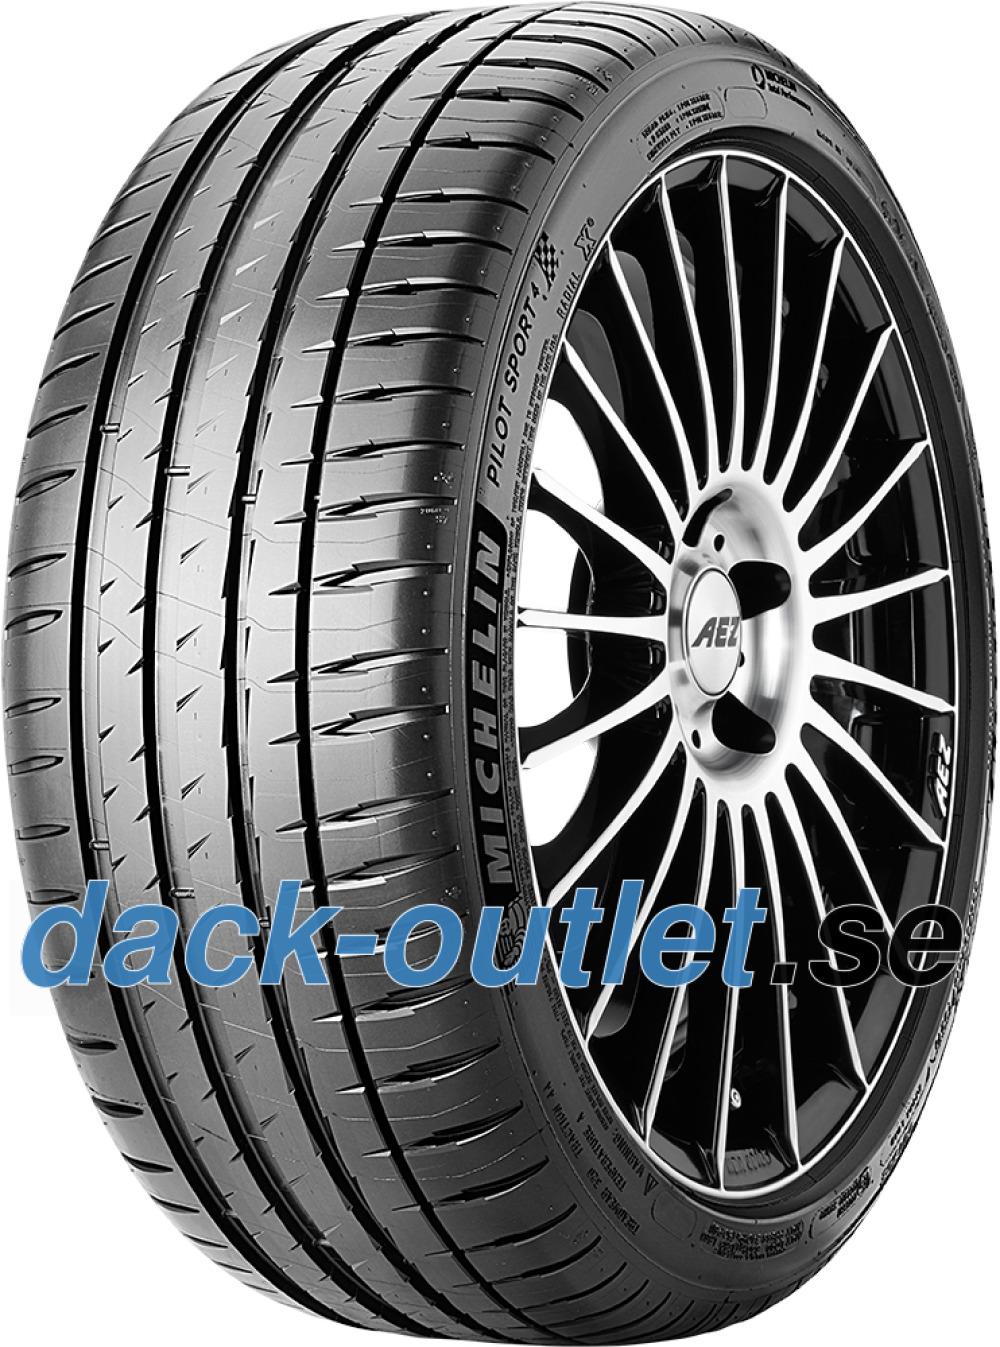 Michelin Pilot Sport 4 ( 255/45 ZR18 (103Y) XL med fälg skyddslist (FSL) )